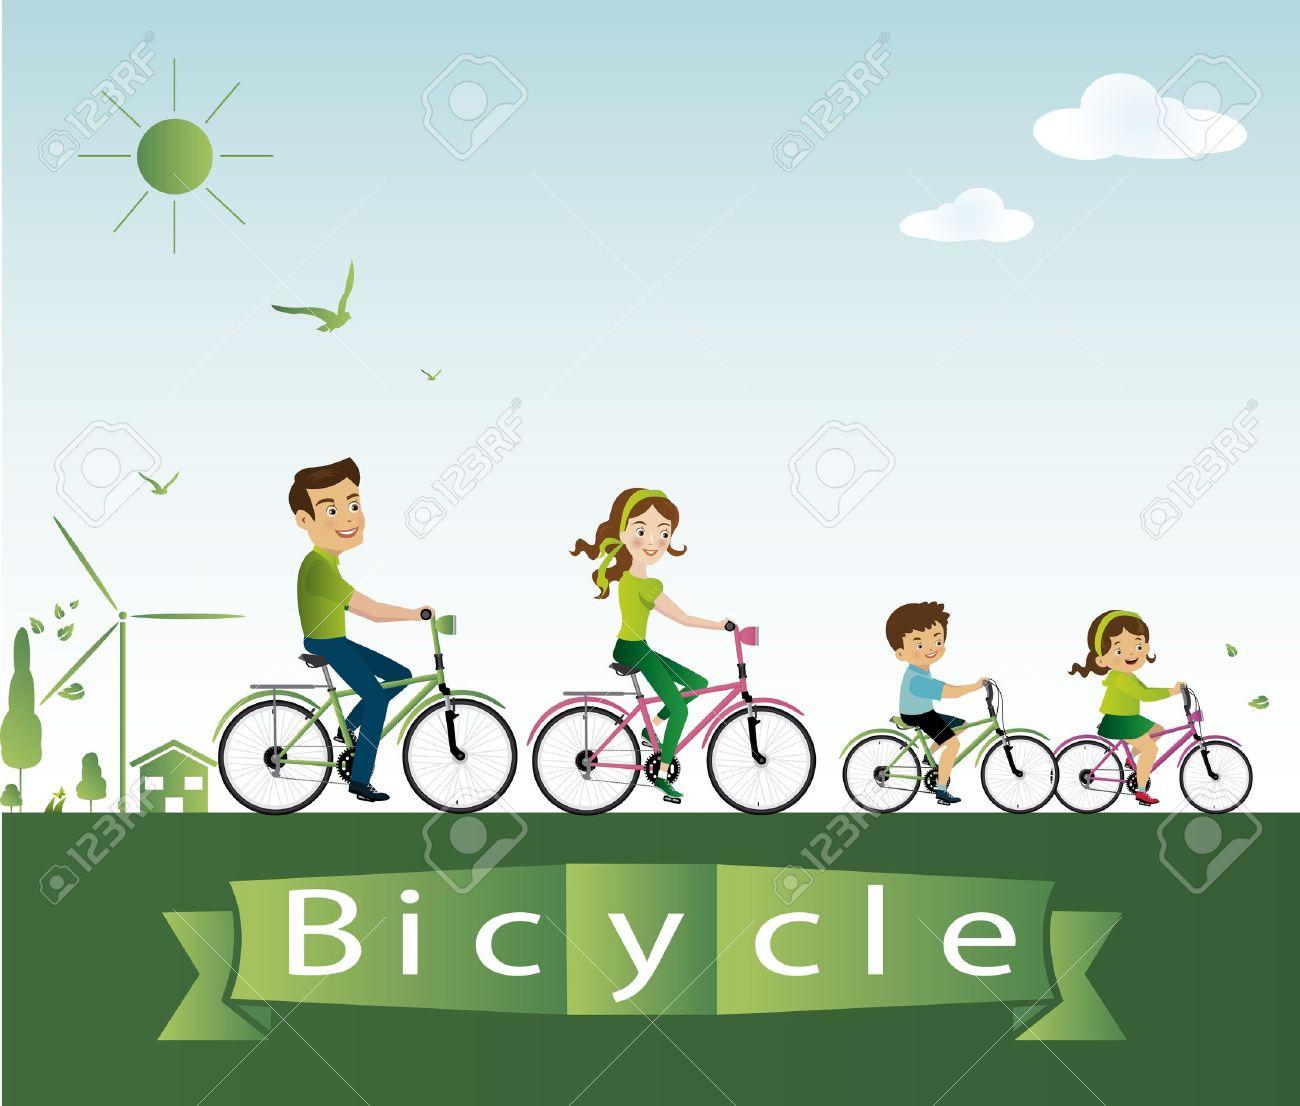 Biking clipart illustration. Bike family cycling pencil